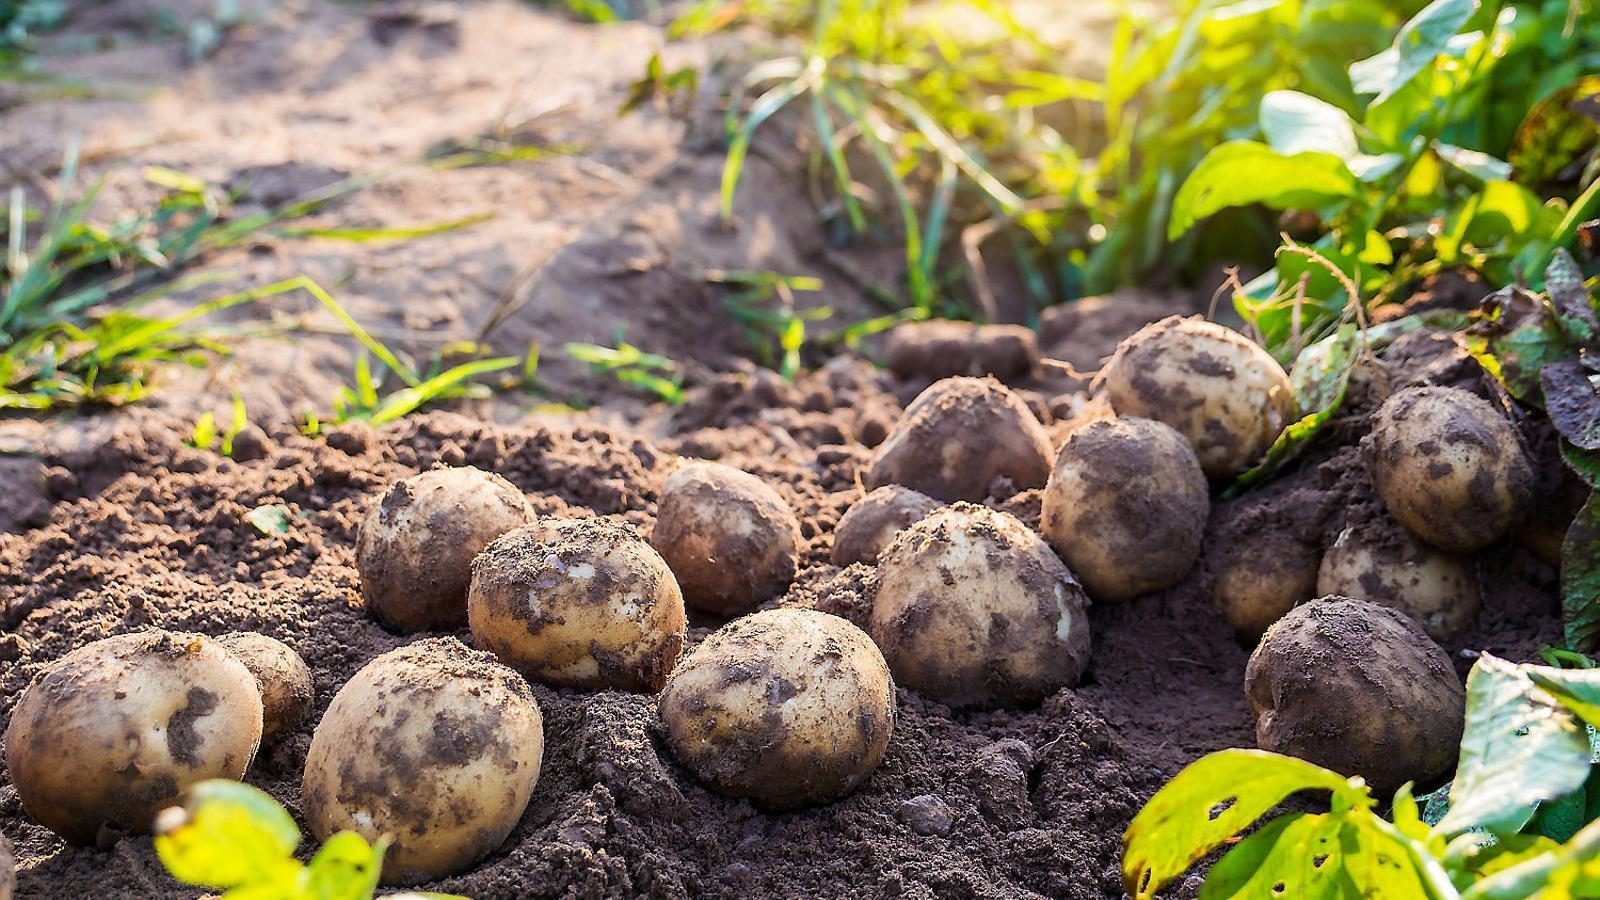 Patates,  un clàssic